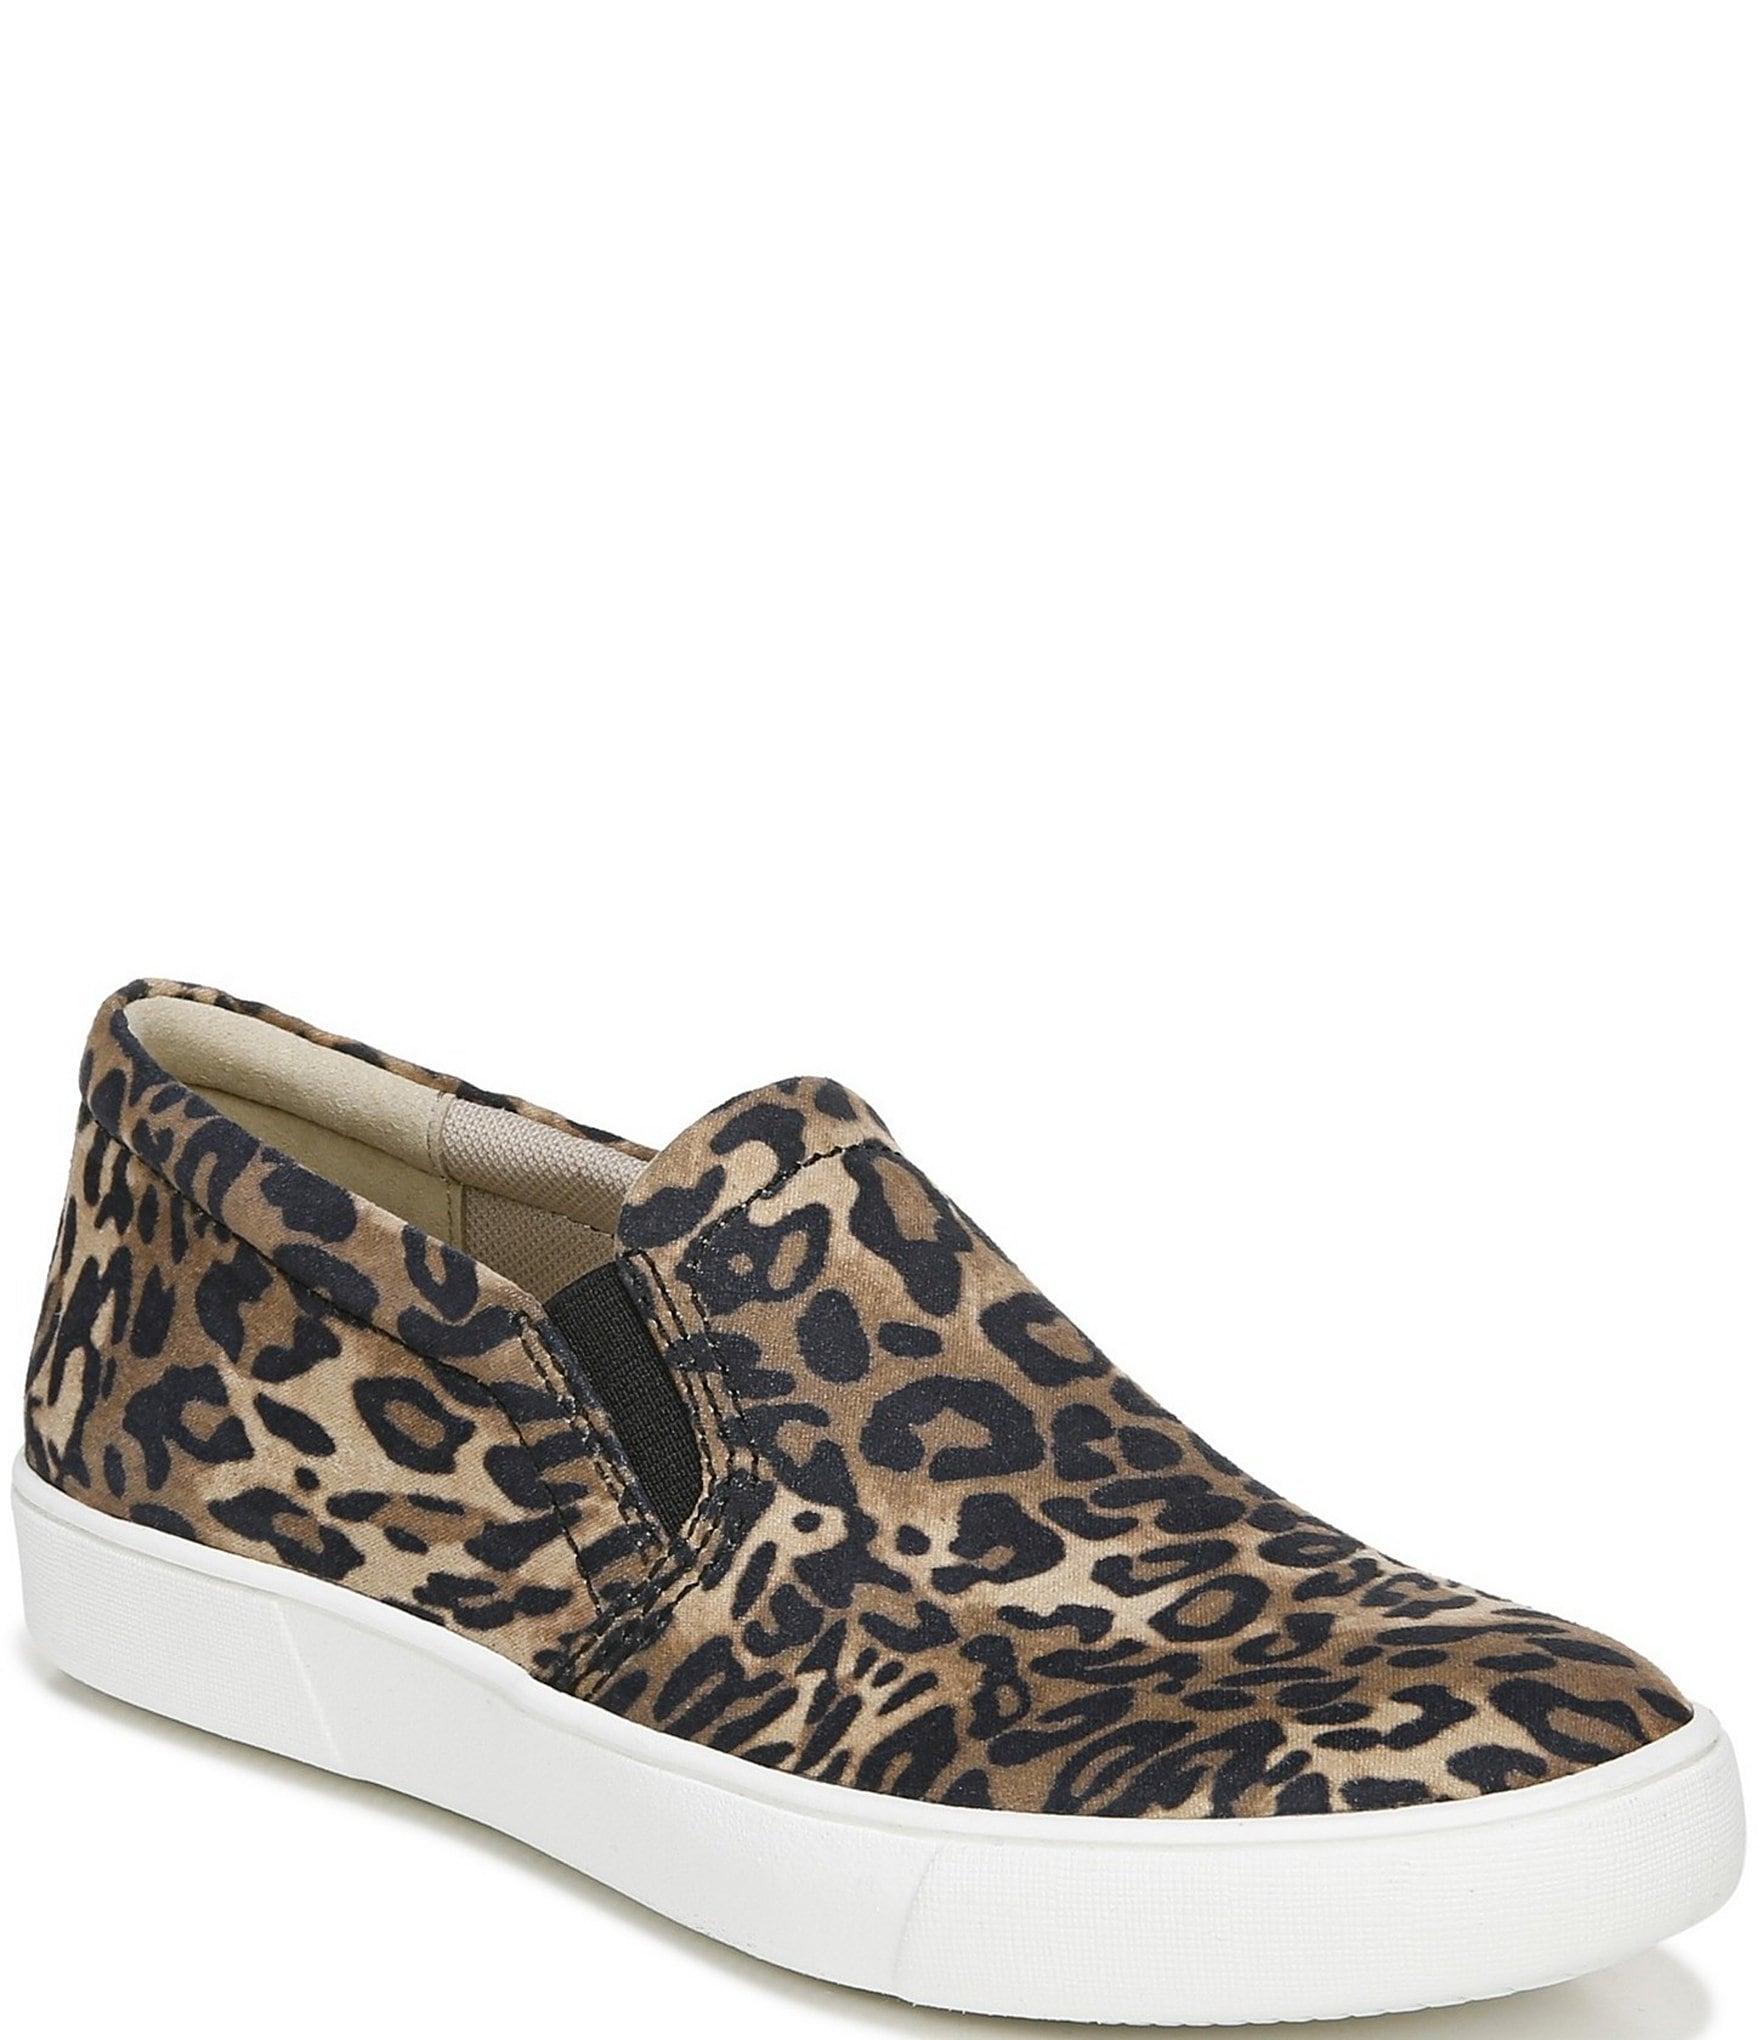 Naturalizer Animal Women's Shoes